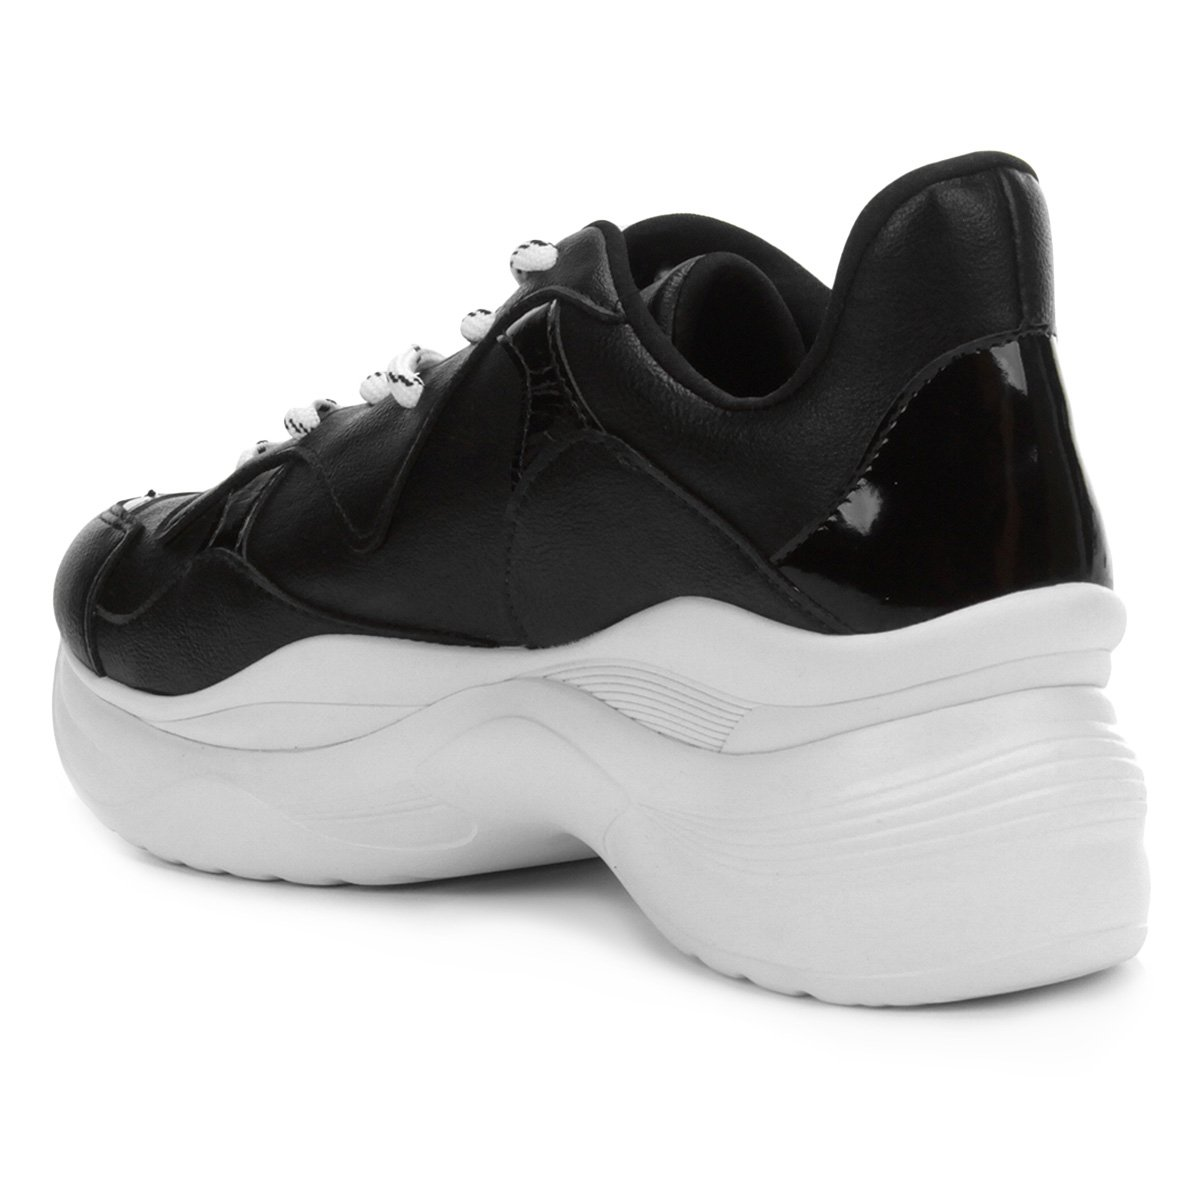 47480cc27 Tênis Tanara Chunky Sneaker Feminino - Tam: 38 - Shopping TudoAzul